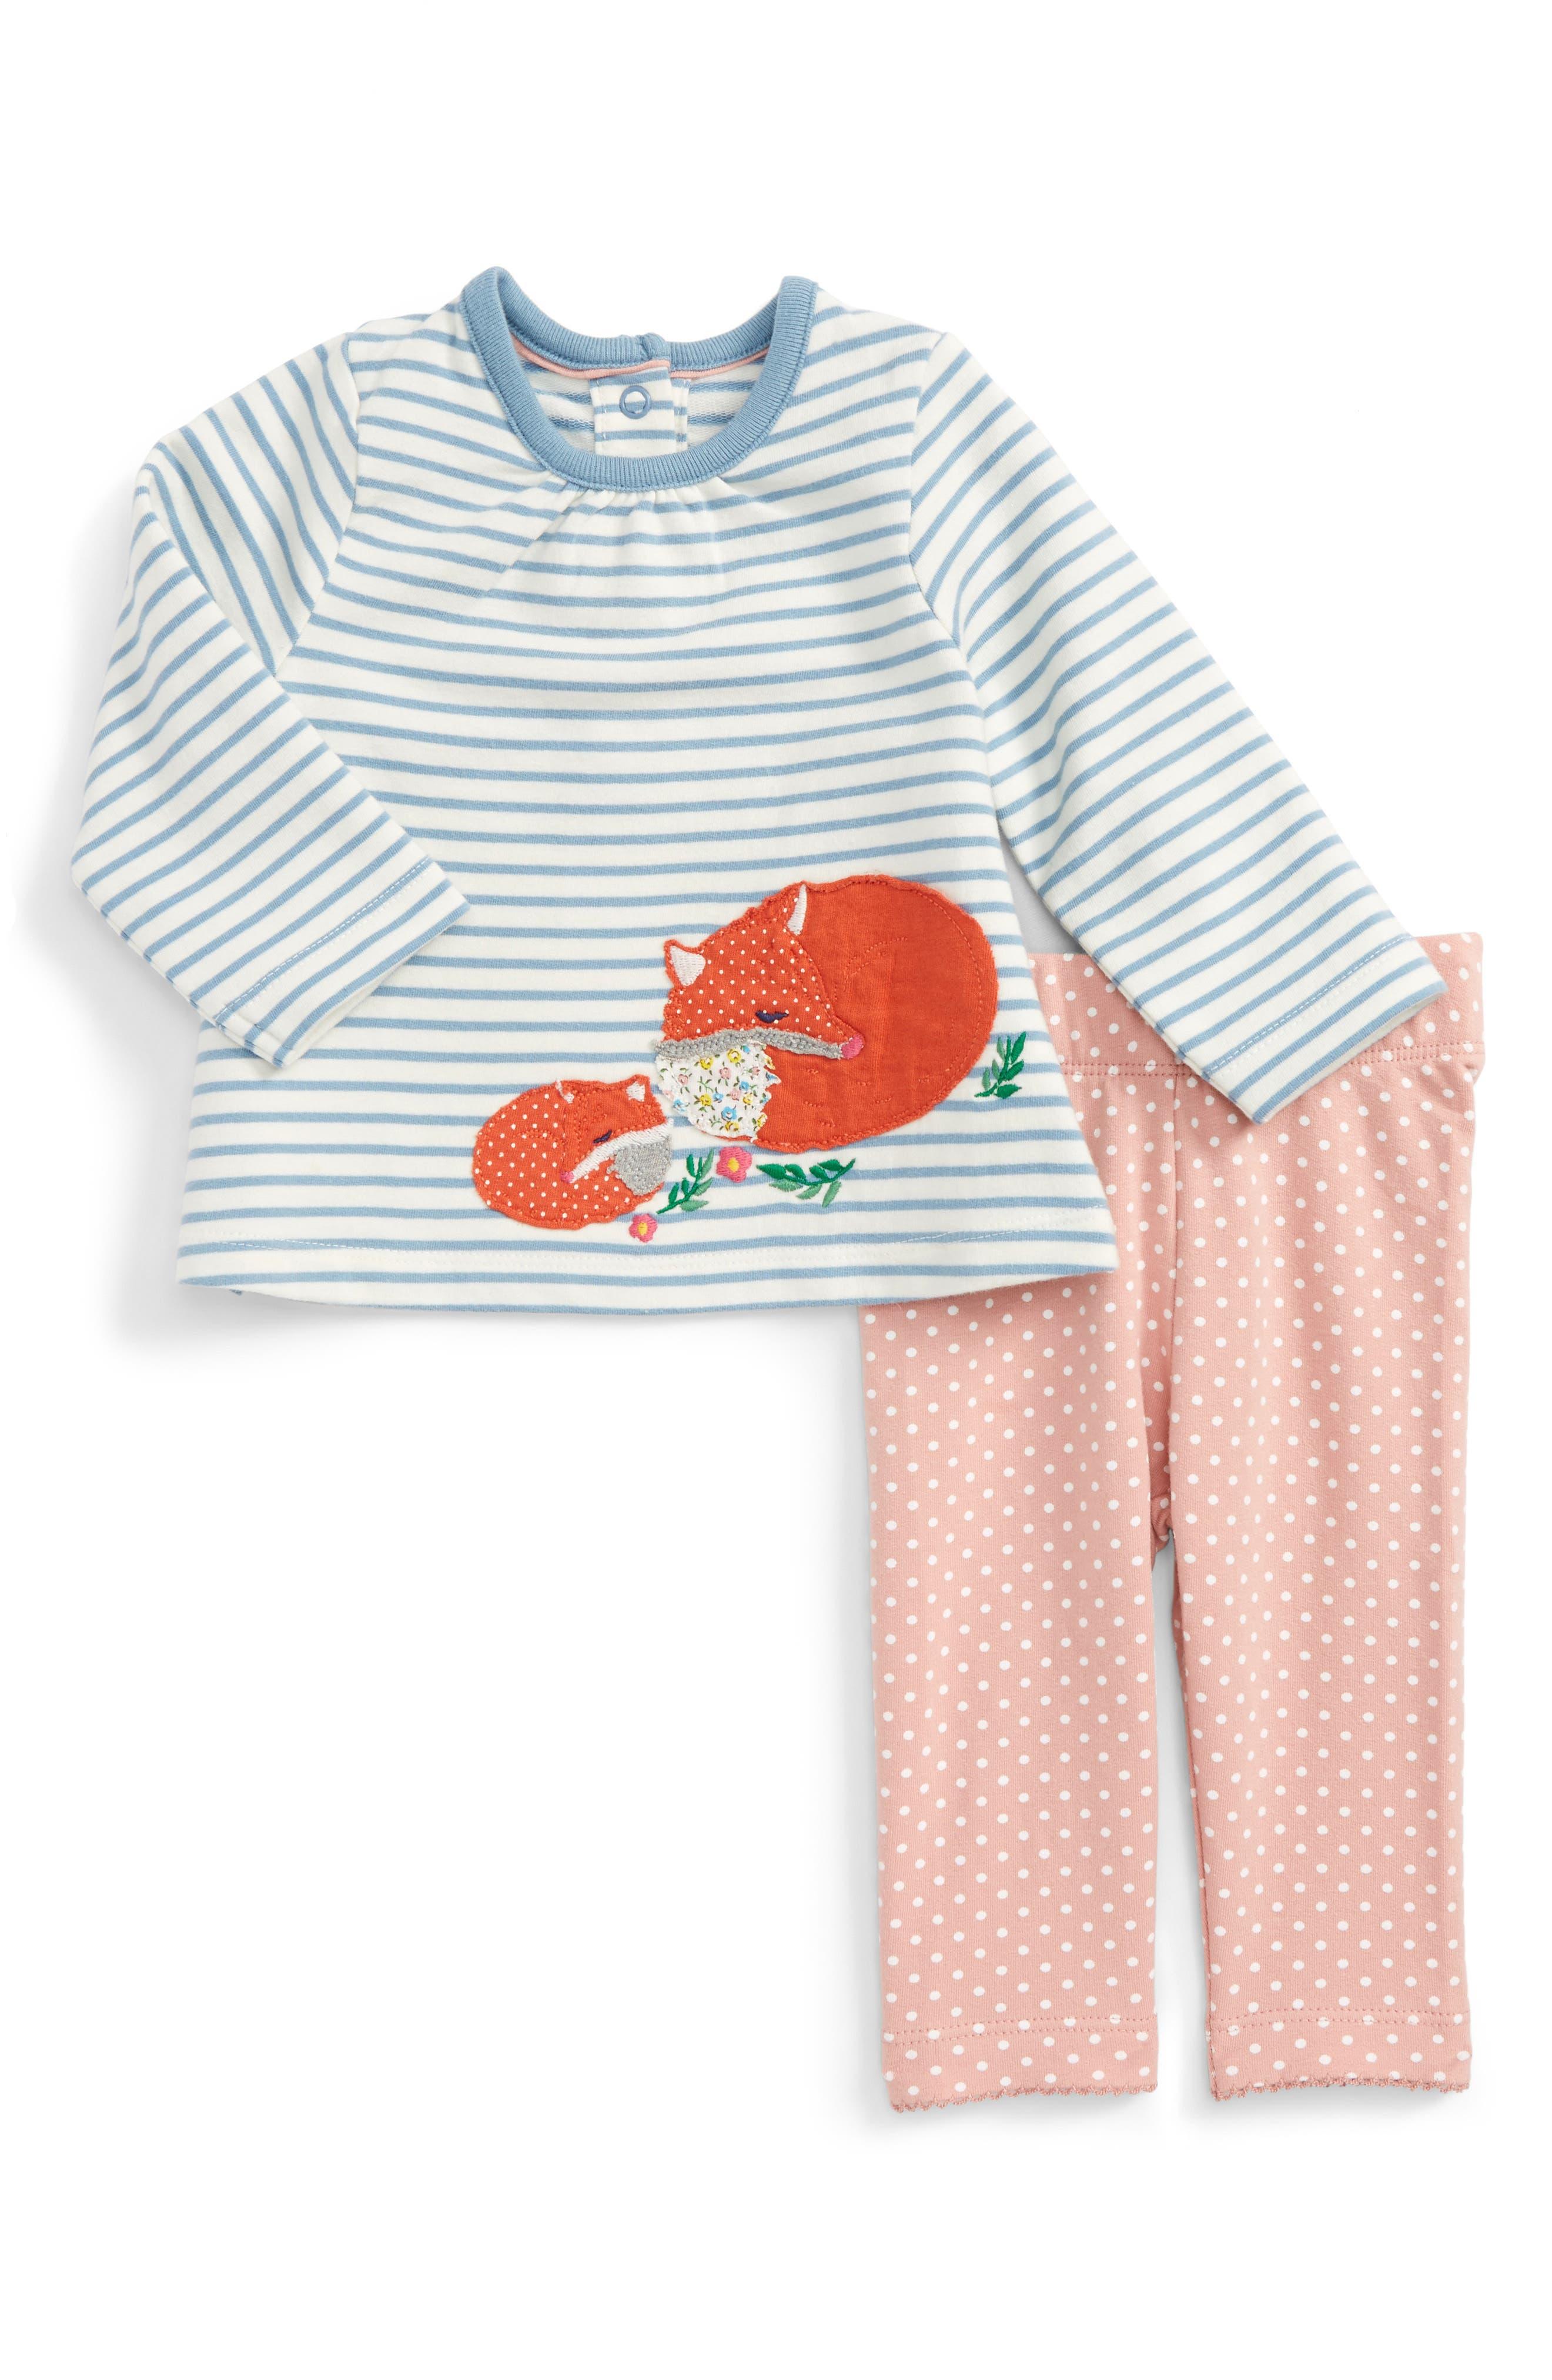 Main Image - Mini Boden Animal Friends Tee & Leggings Set (Baby Girls & Toddler Girls)